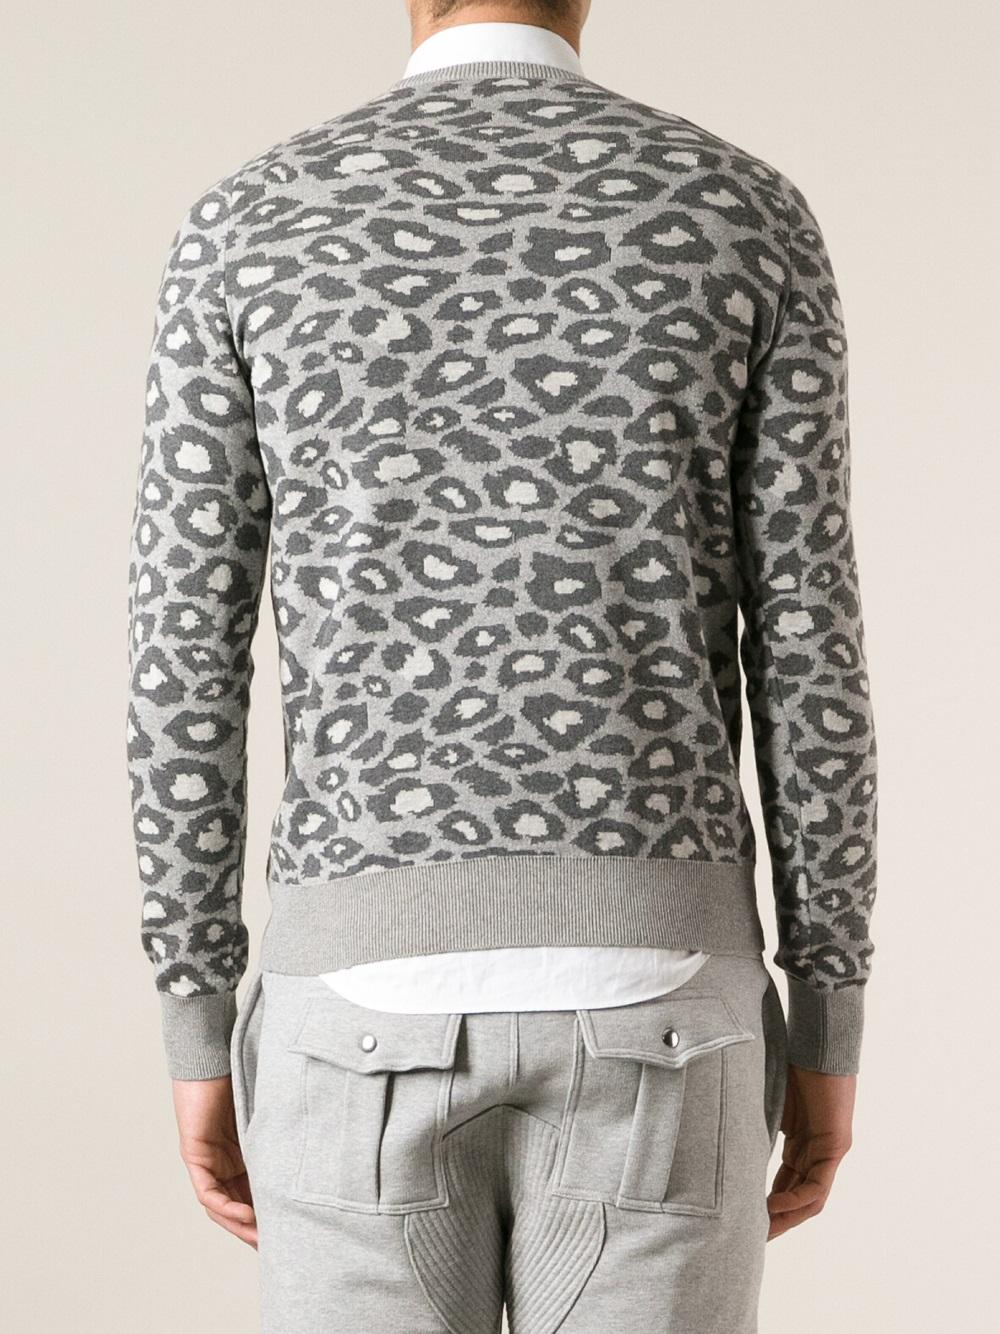 Michael bastian Leopard Print Sweater in Gray for Men | Lyst